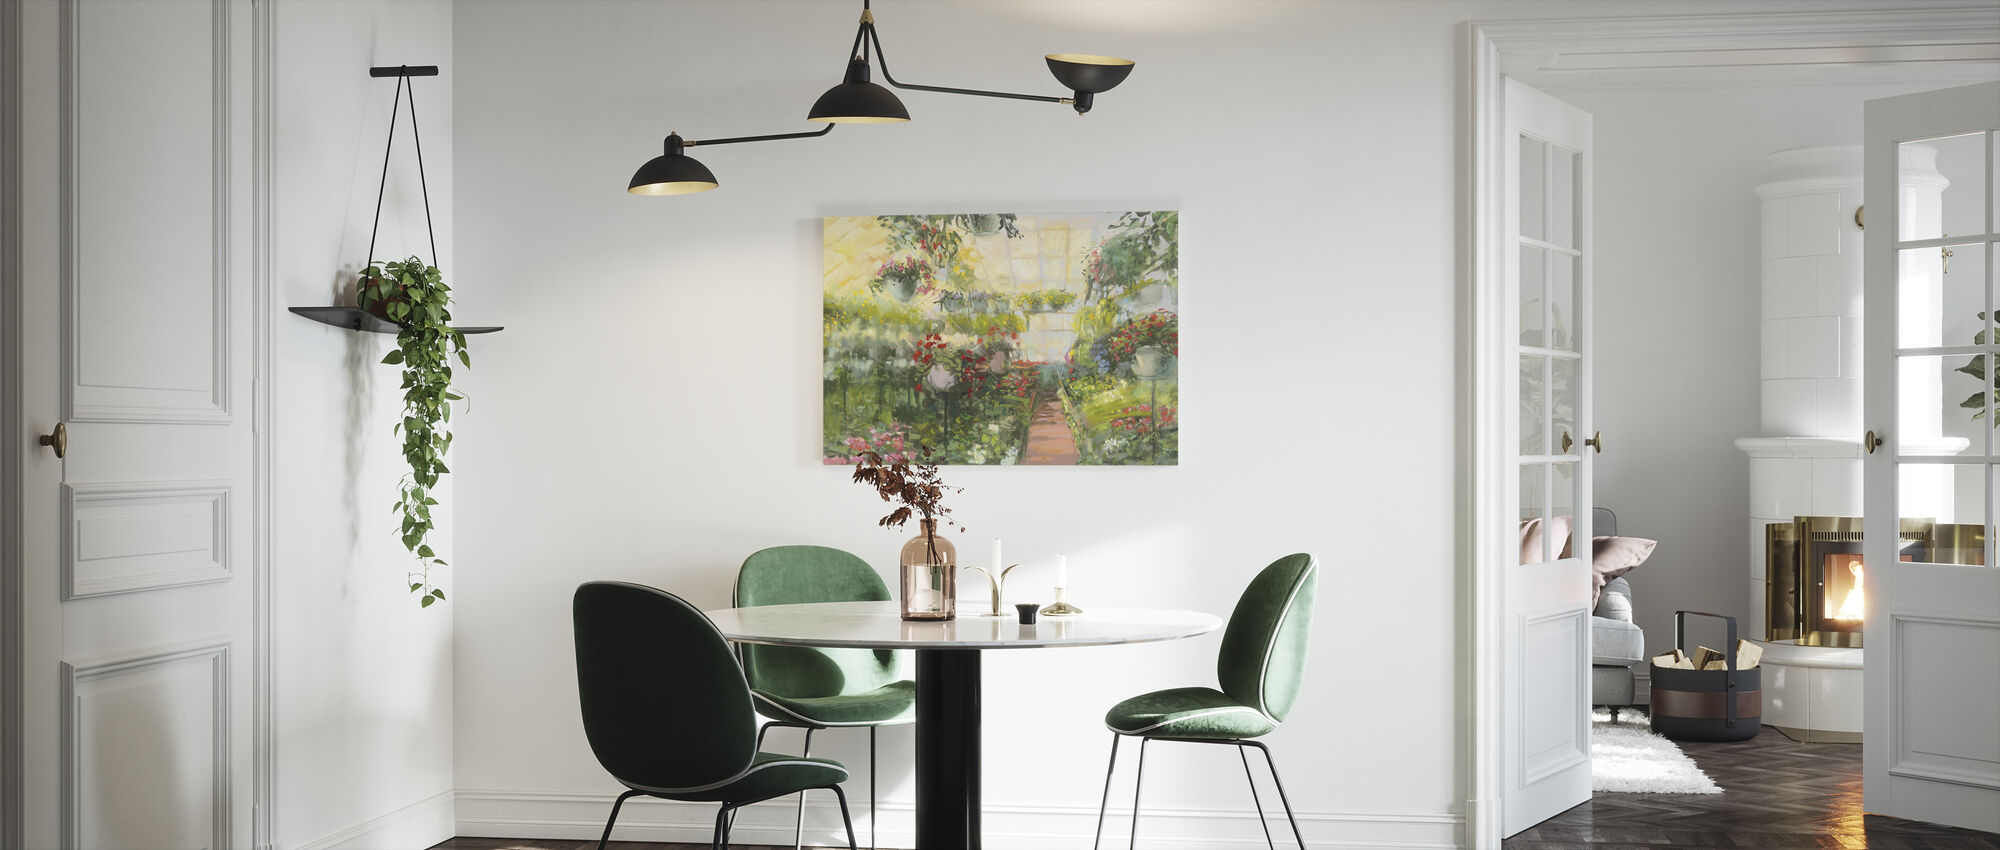 Greenhouse Flowers - Canvas print - Kitchen